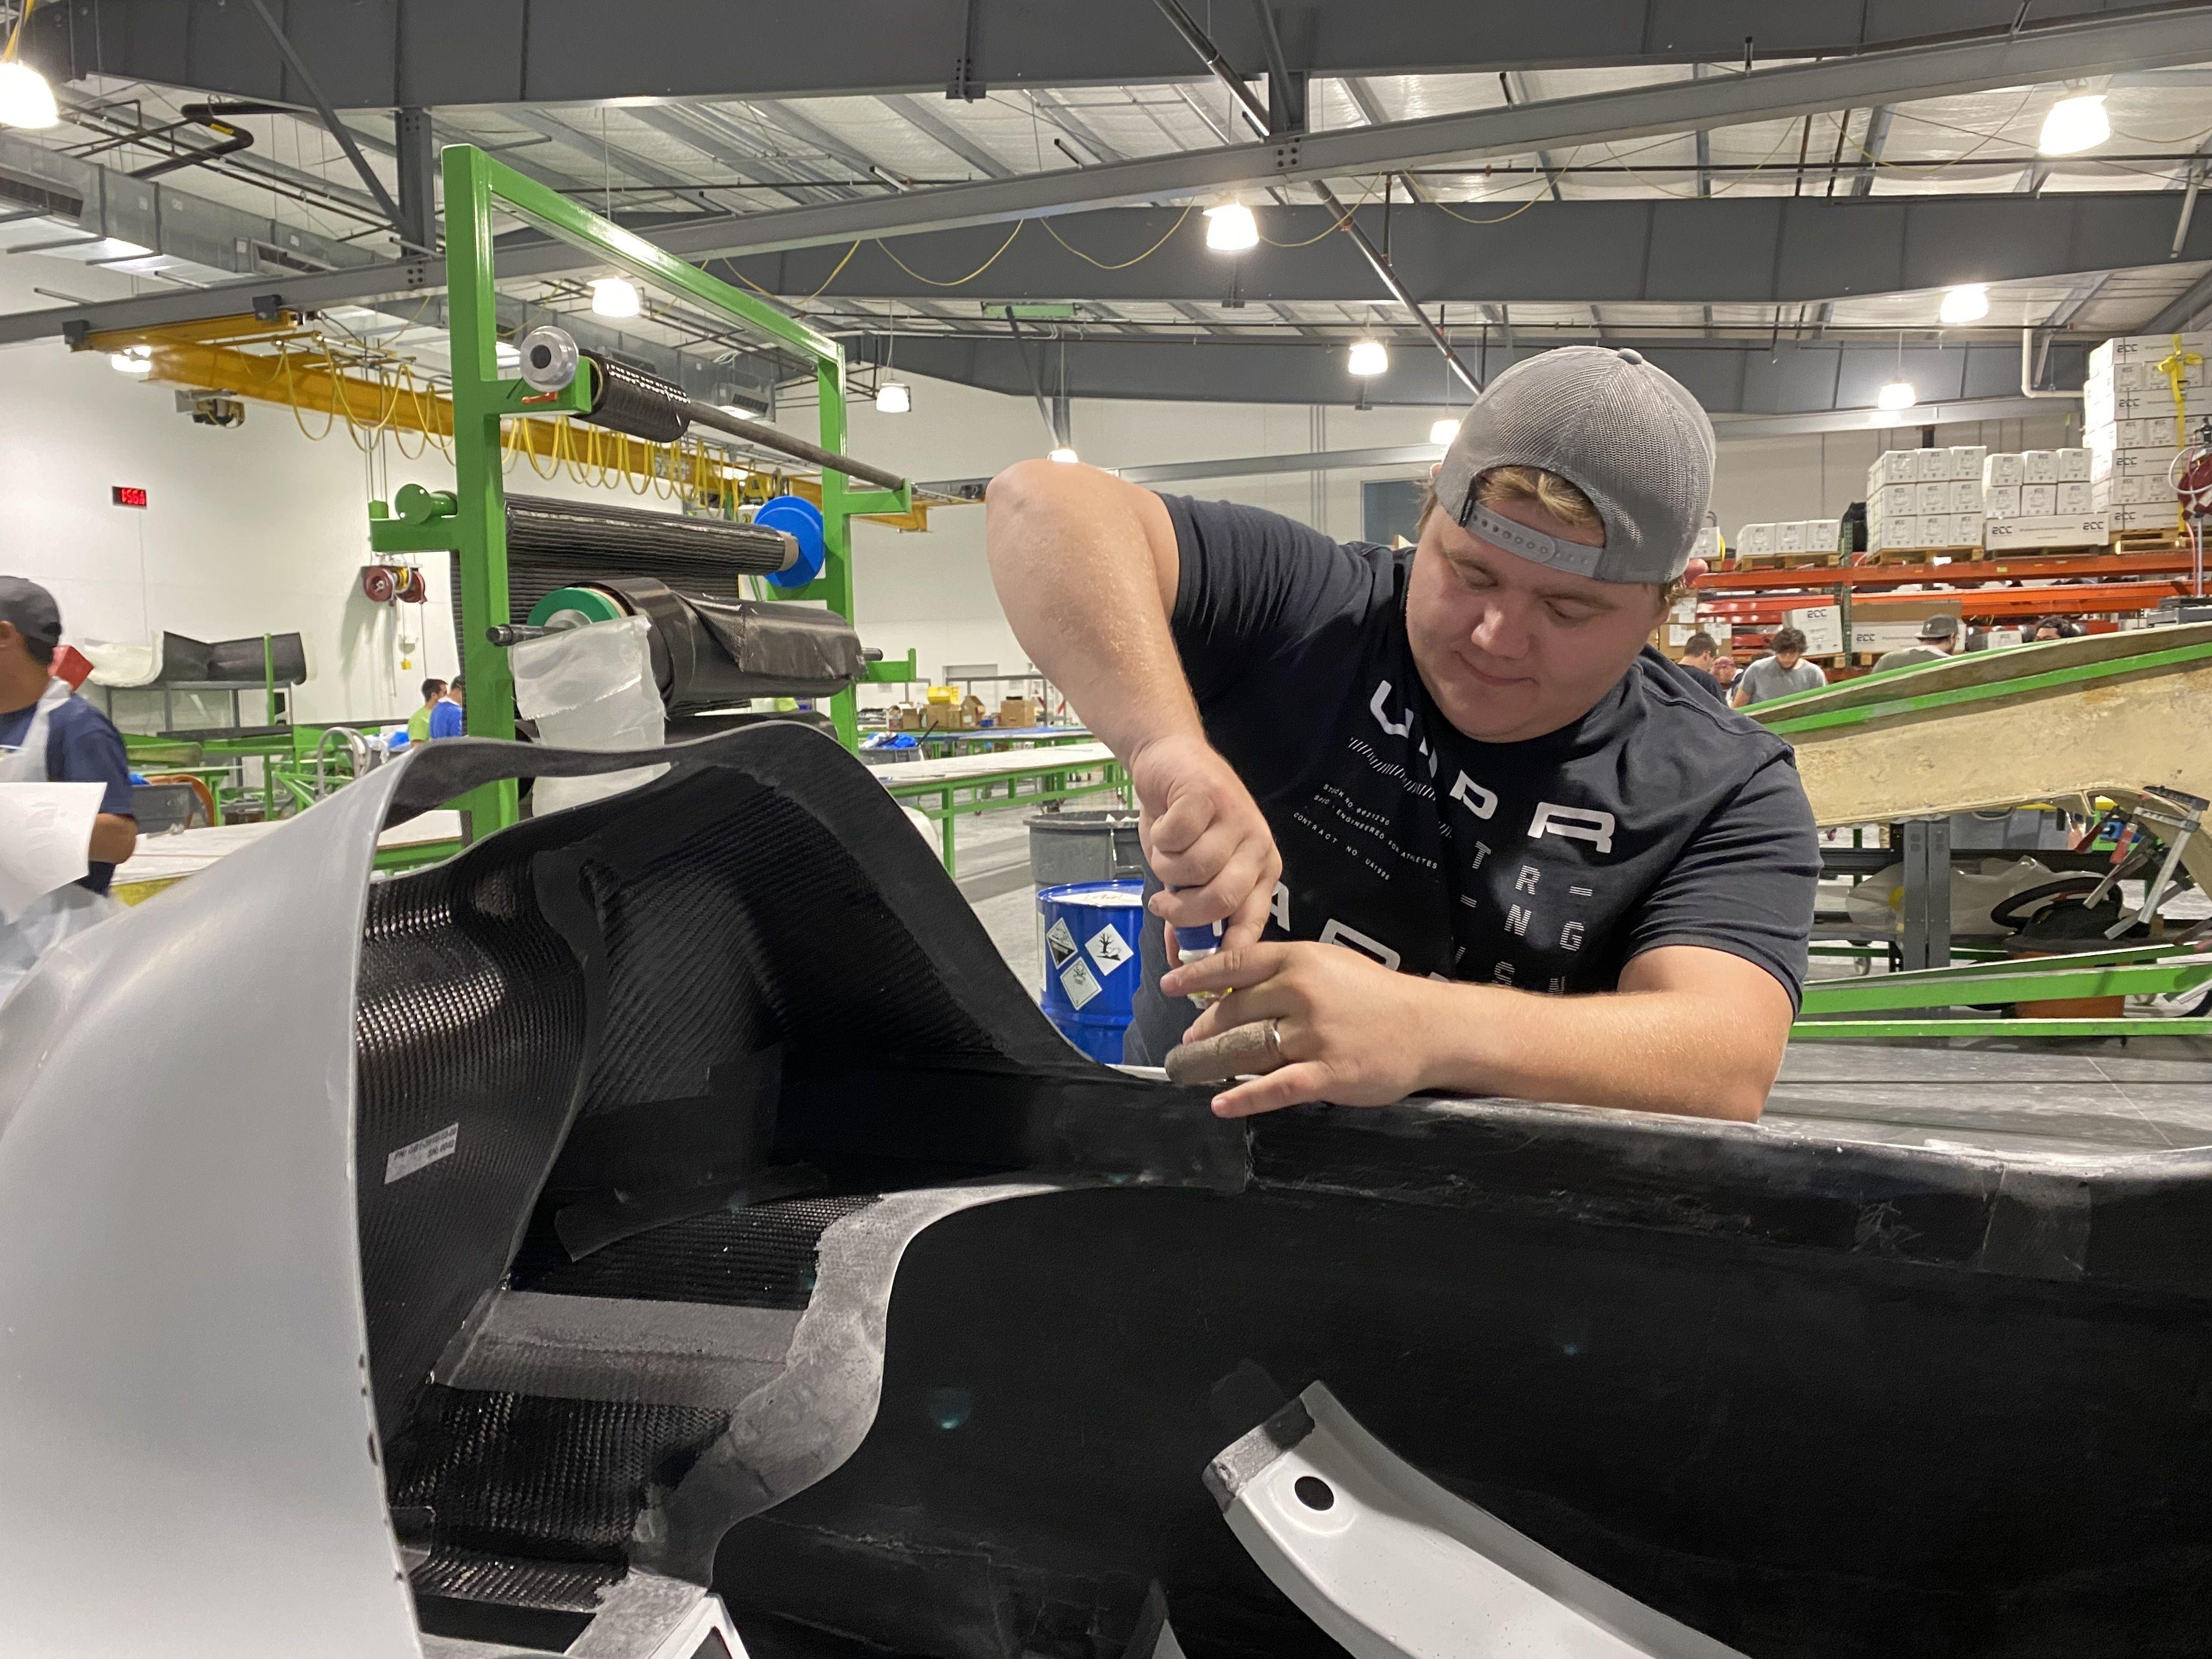 A worker assembles parts of a GameBird 1 fuselage.